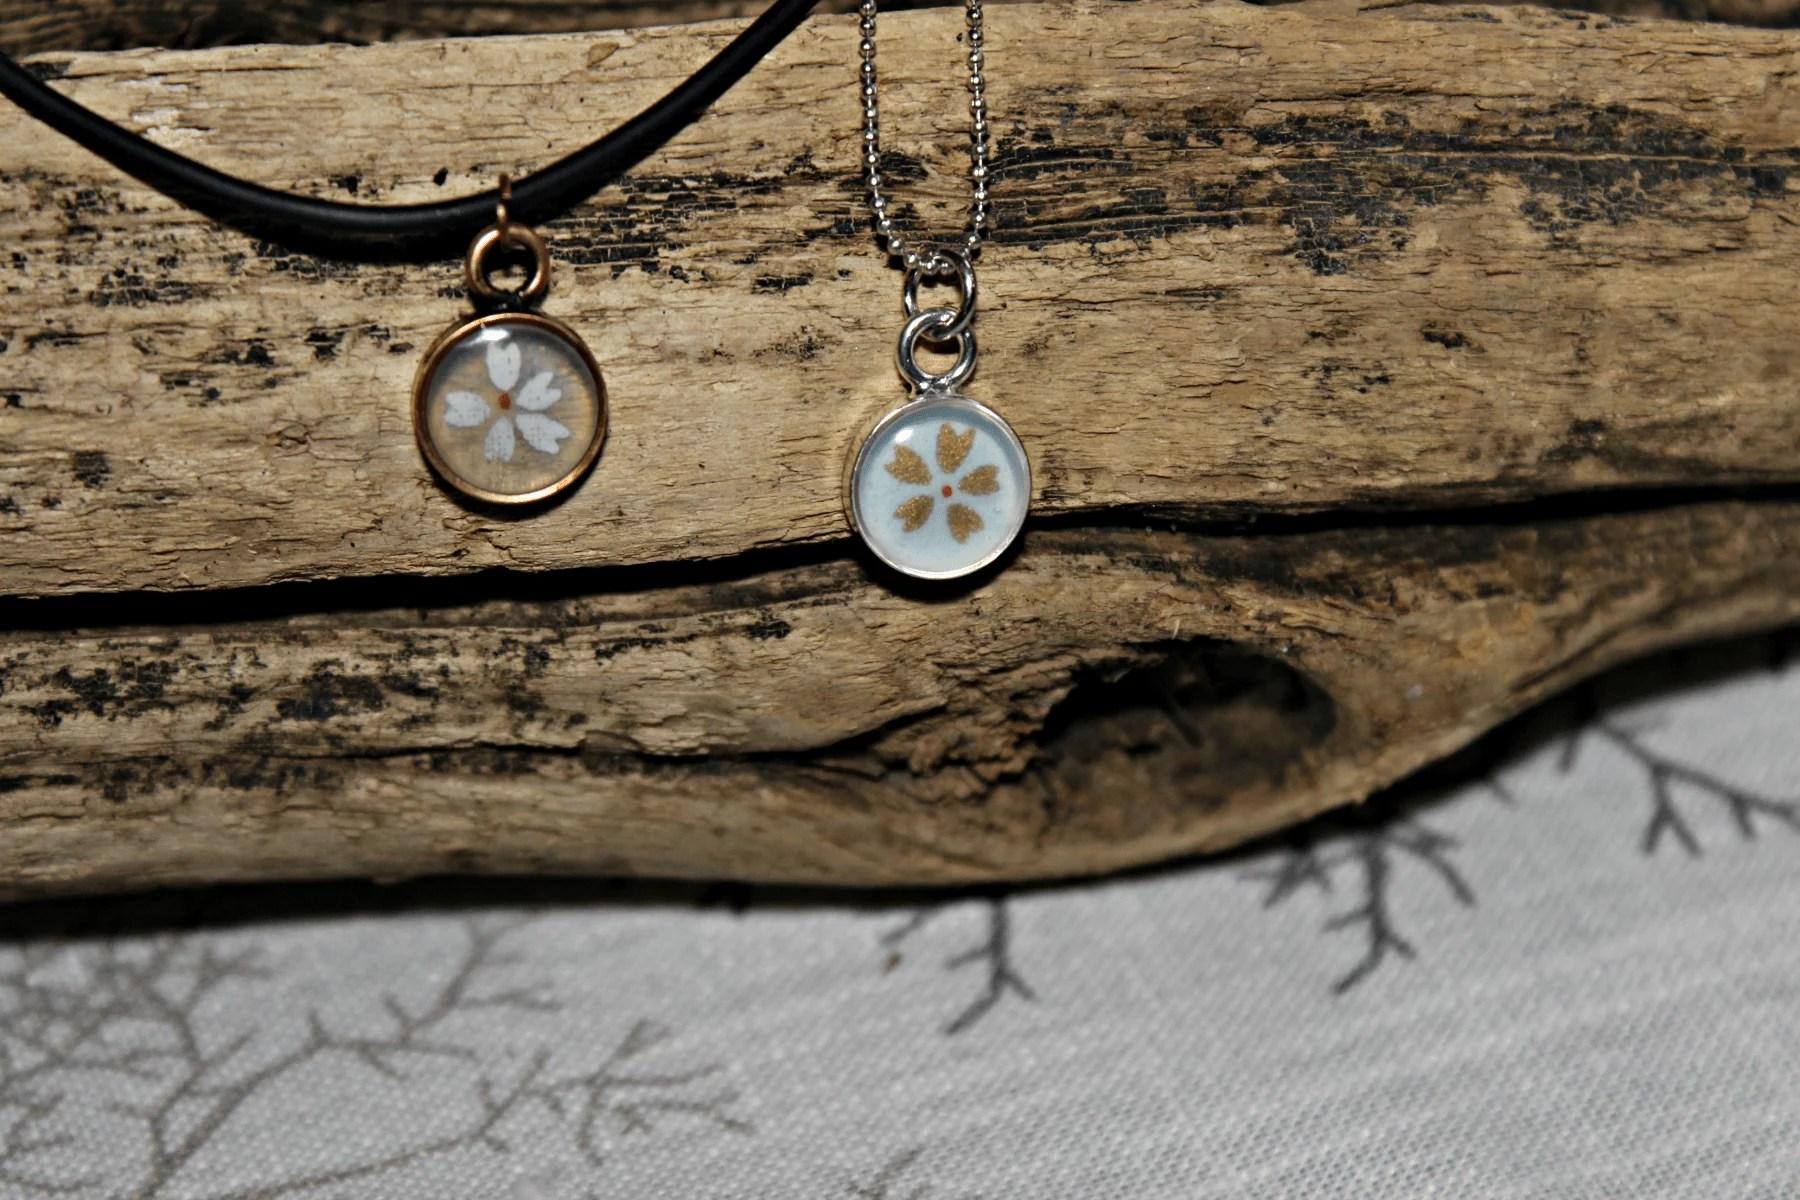 DIY open backed bezel pendants with resin